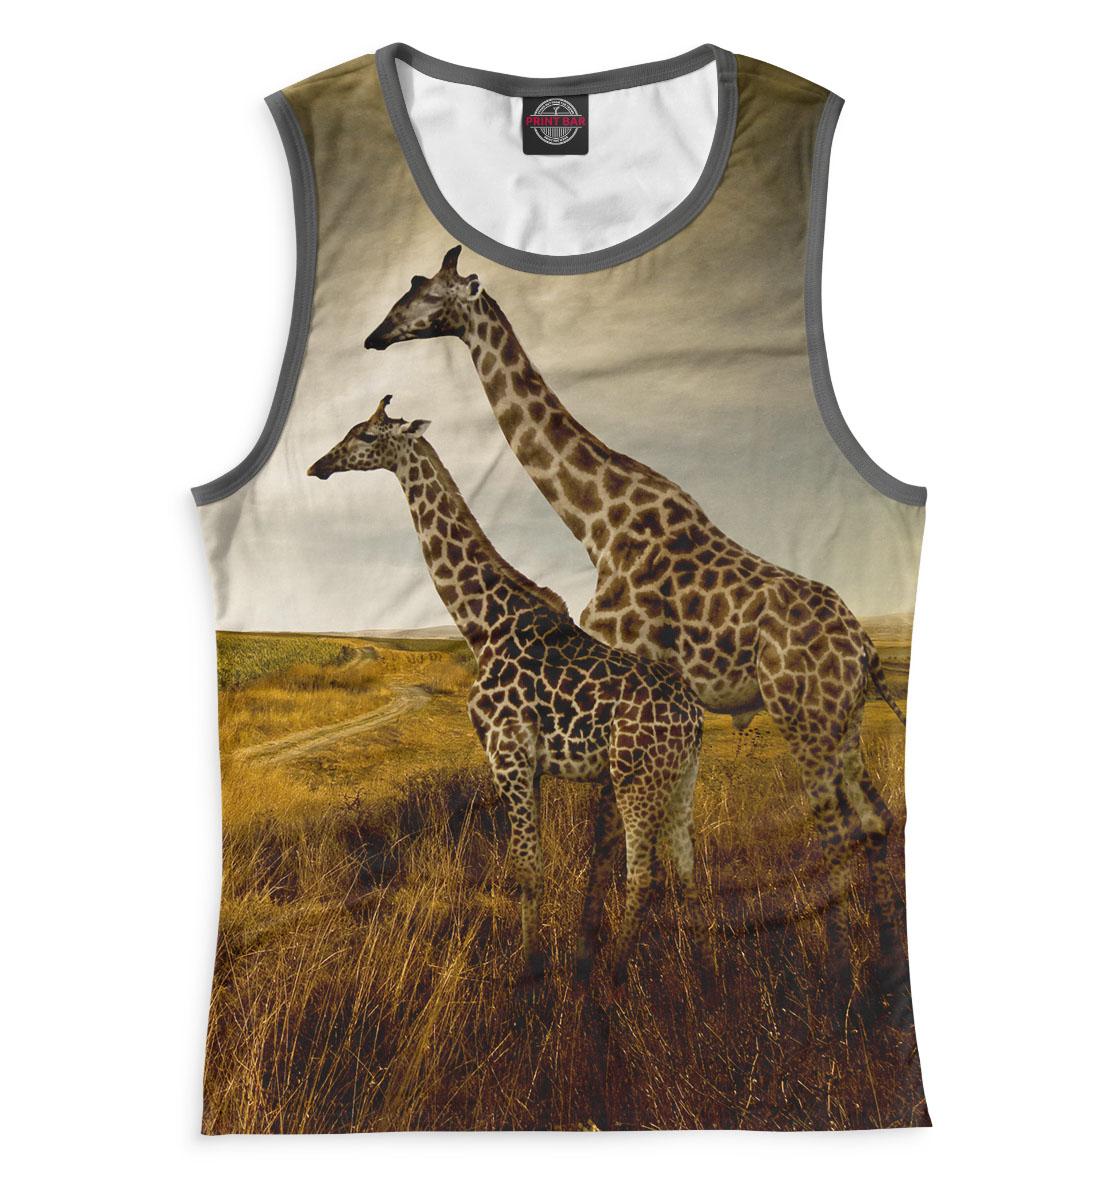 защита на прогулке Жирафы на прогулке